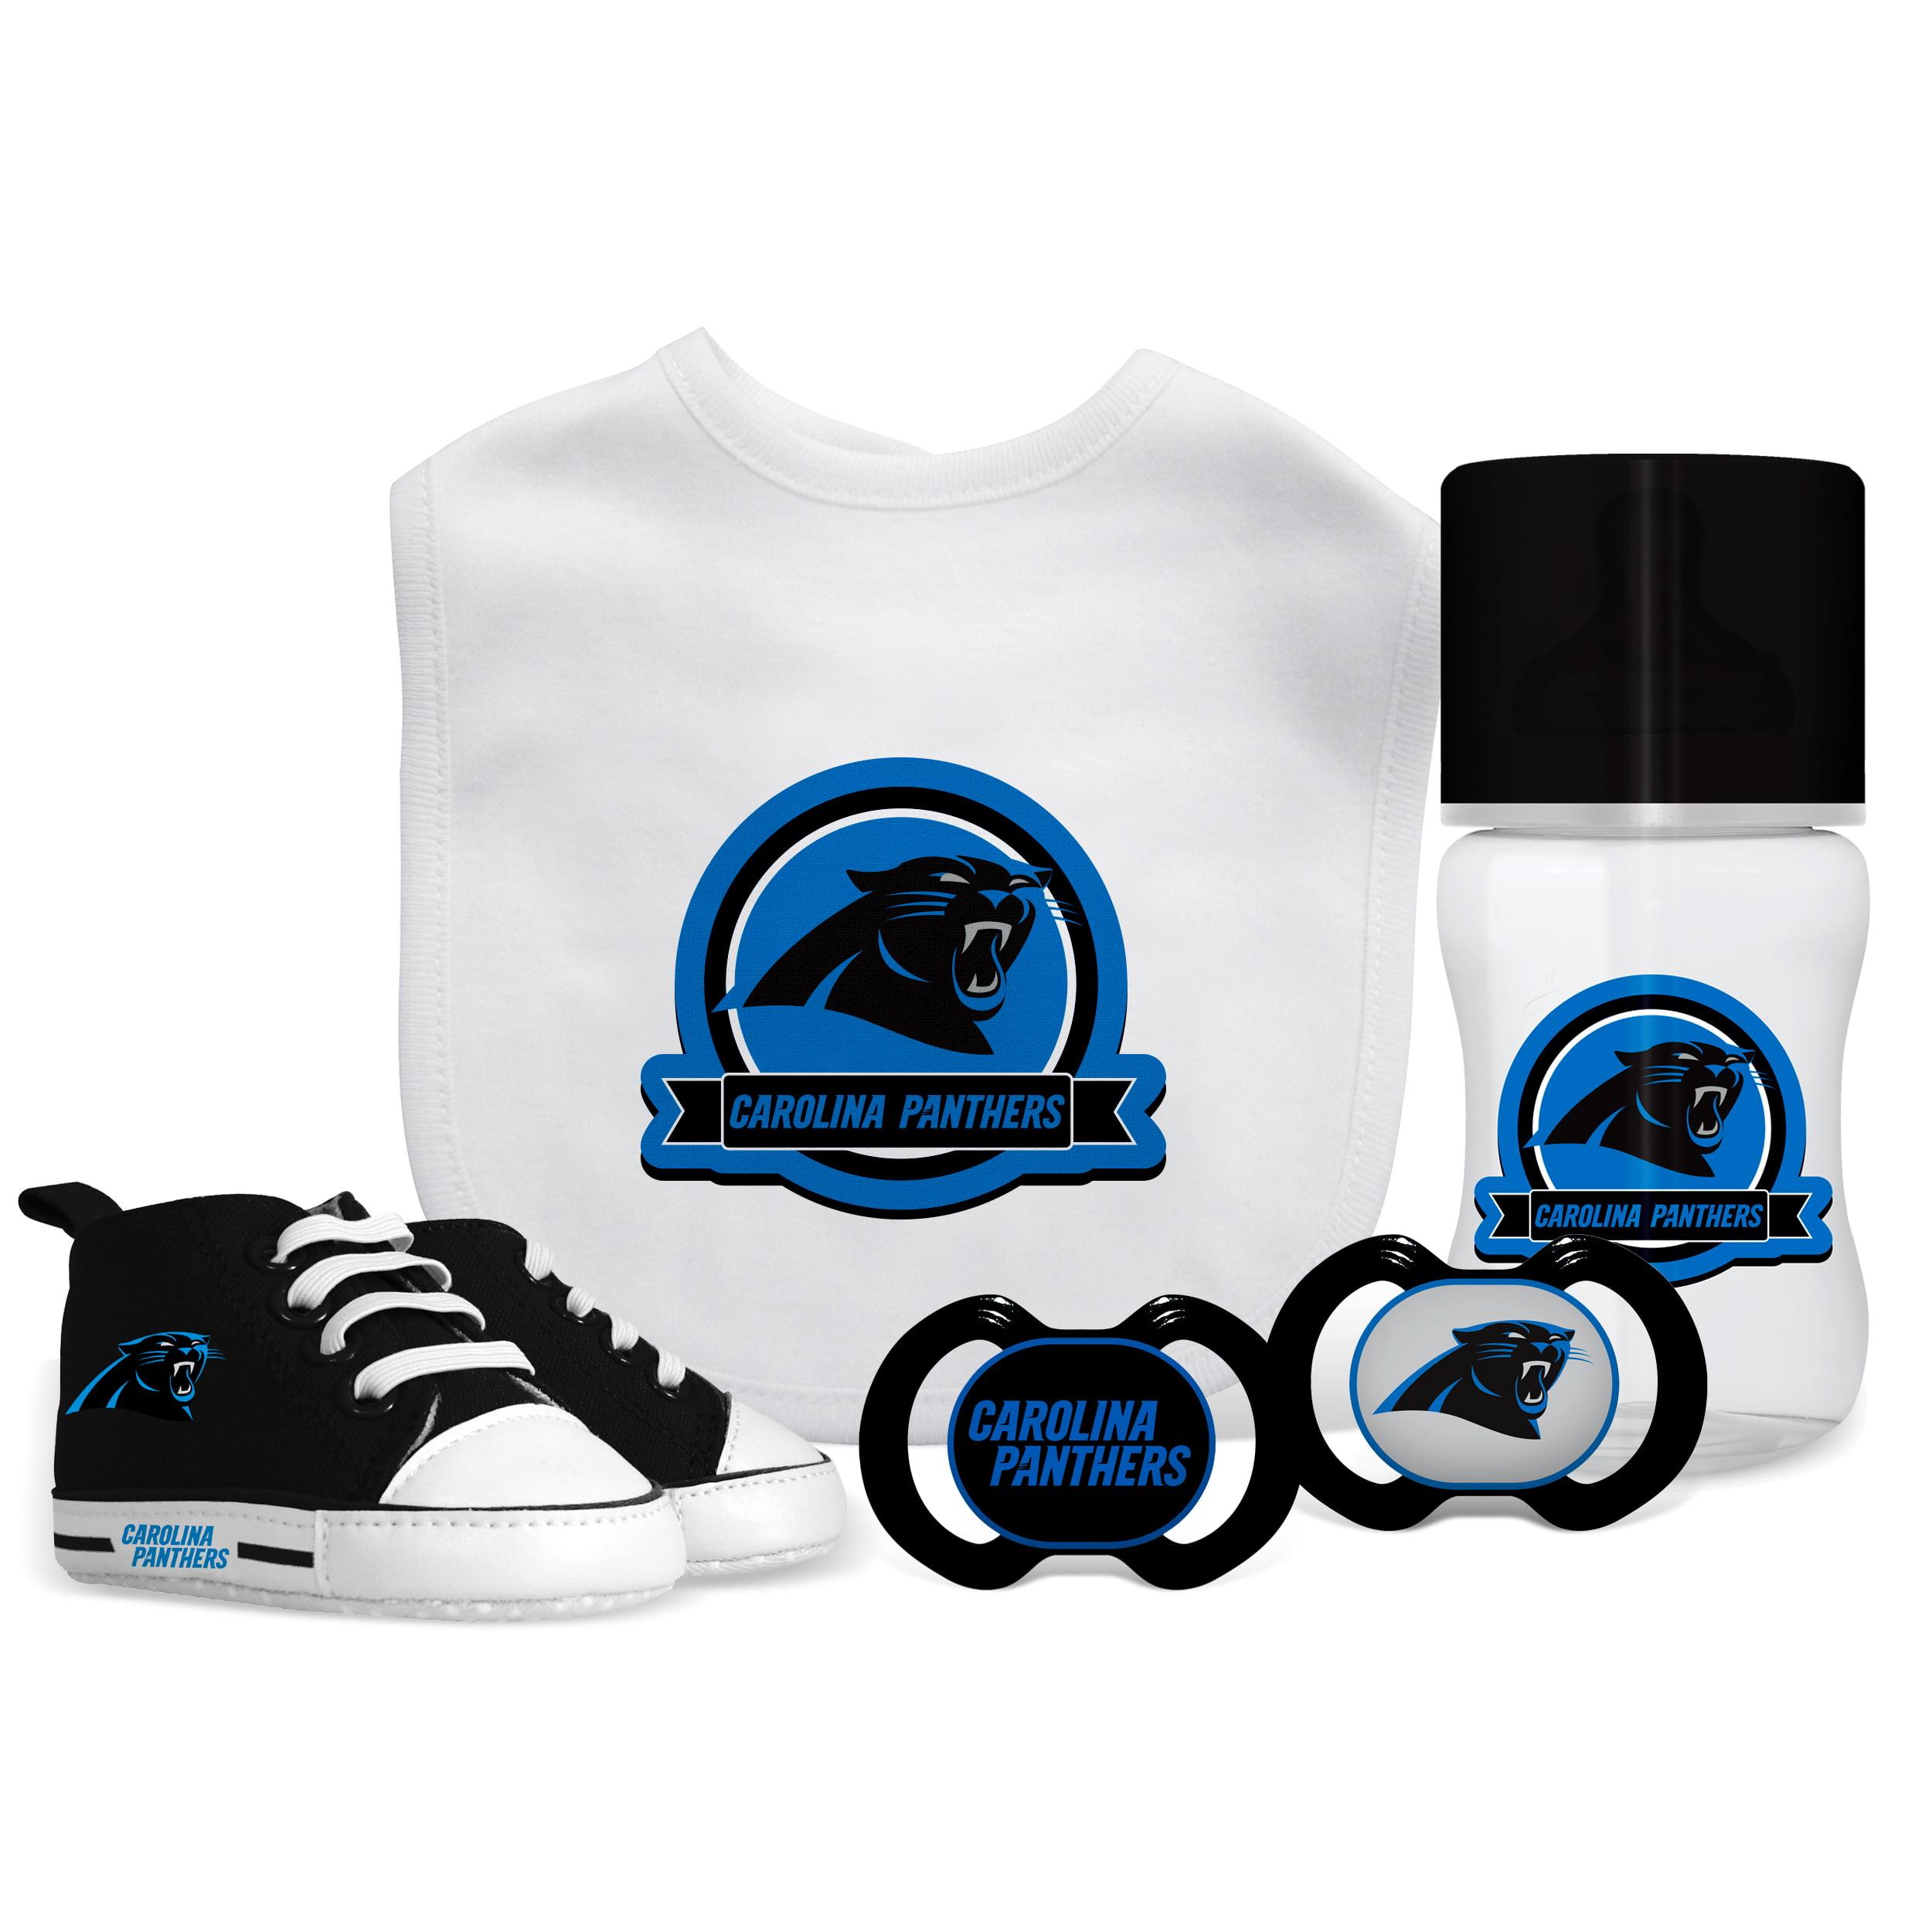 NFL Carolina Panthers 5-Piece Baby Gift Set